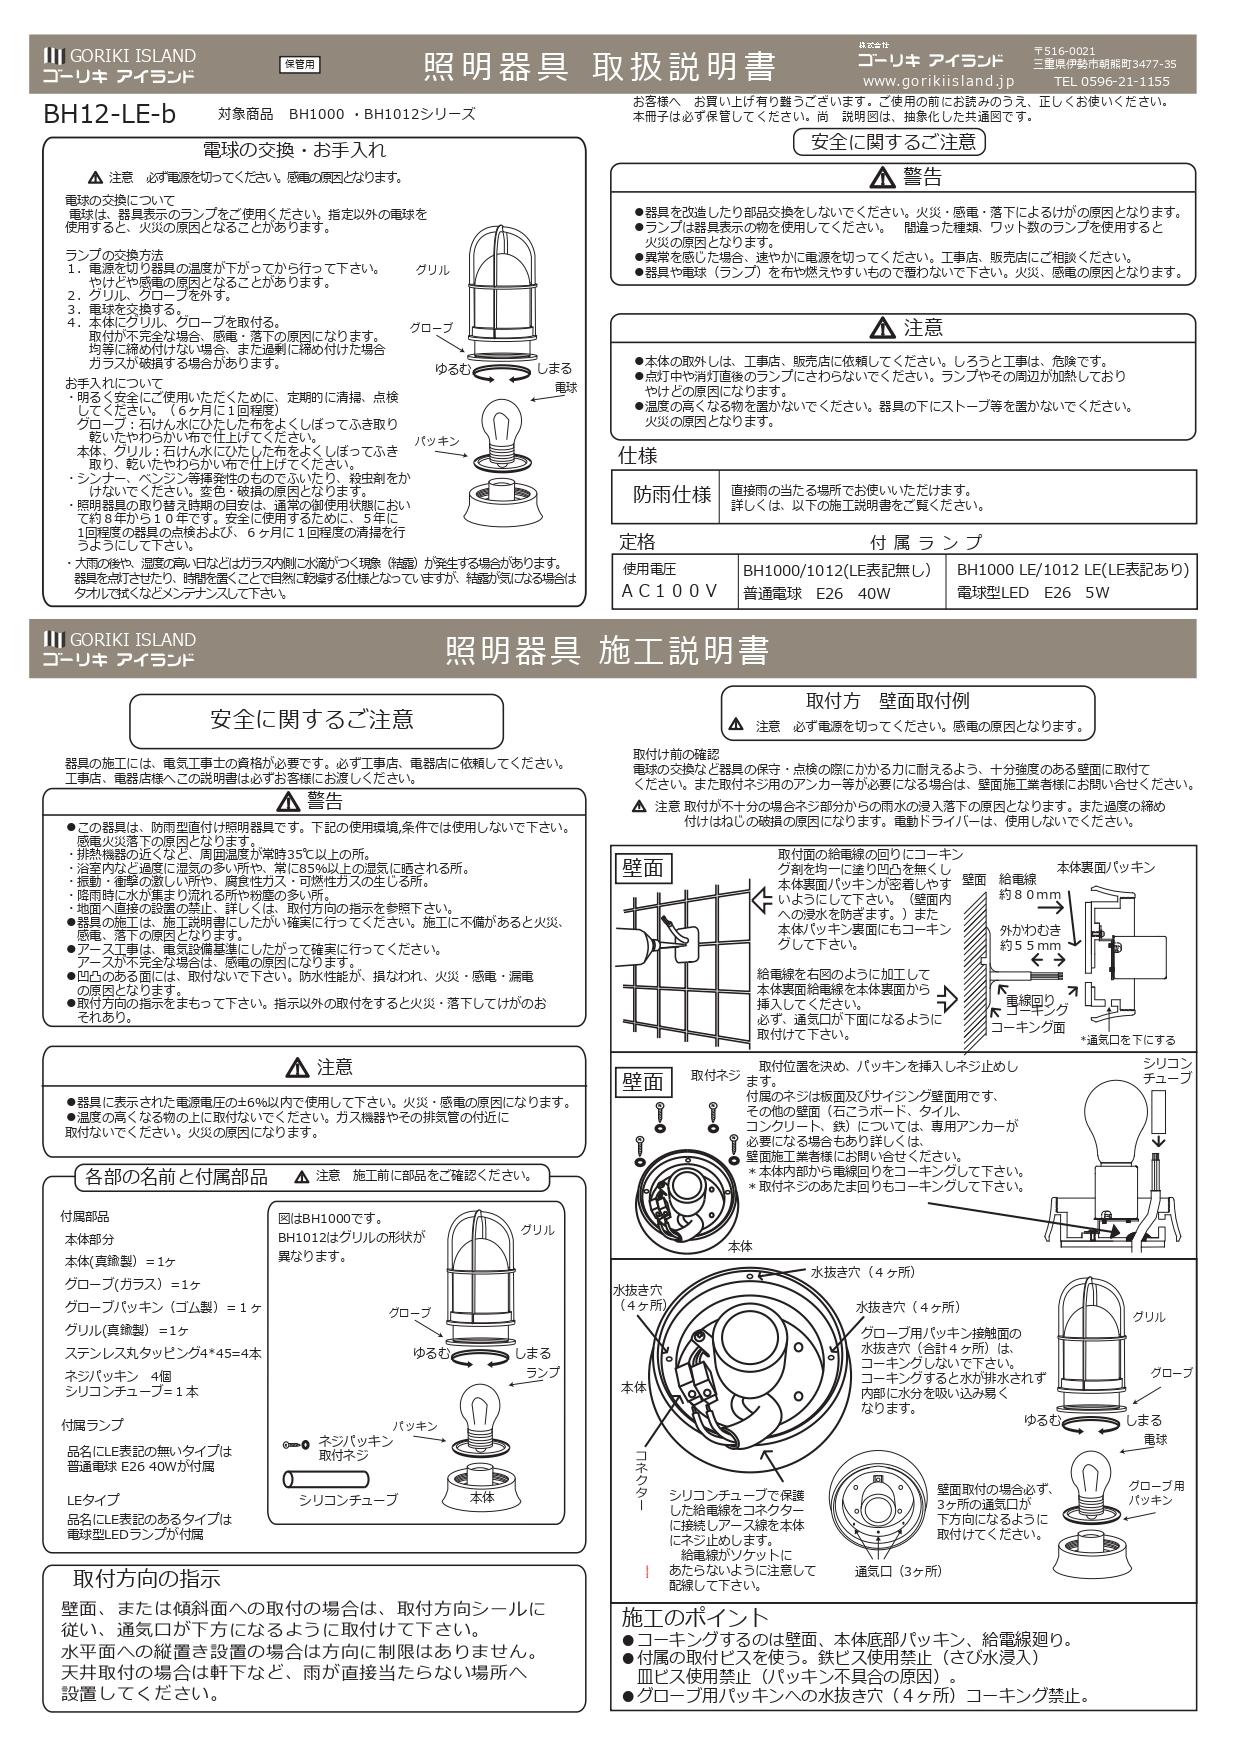 BH1000 BK Chips 施工説明書_page-0001